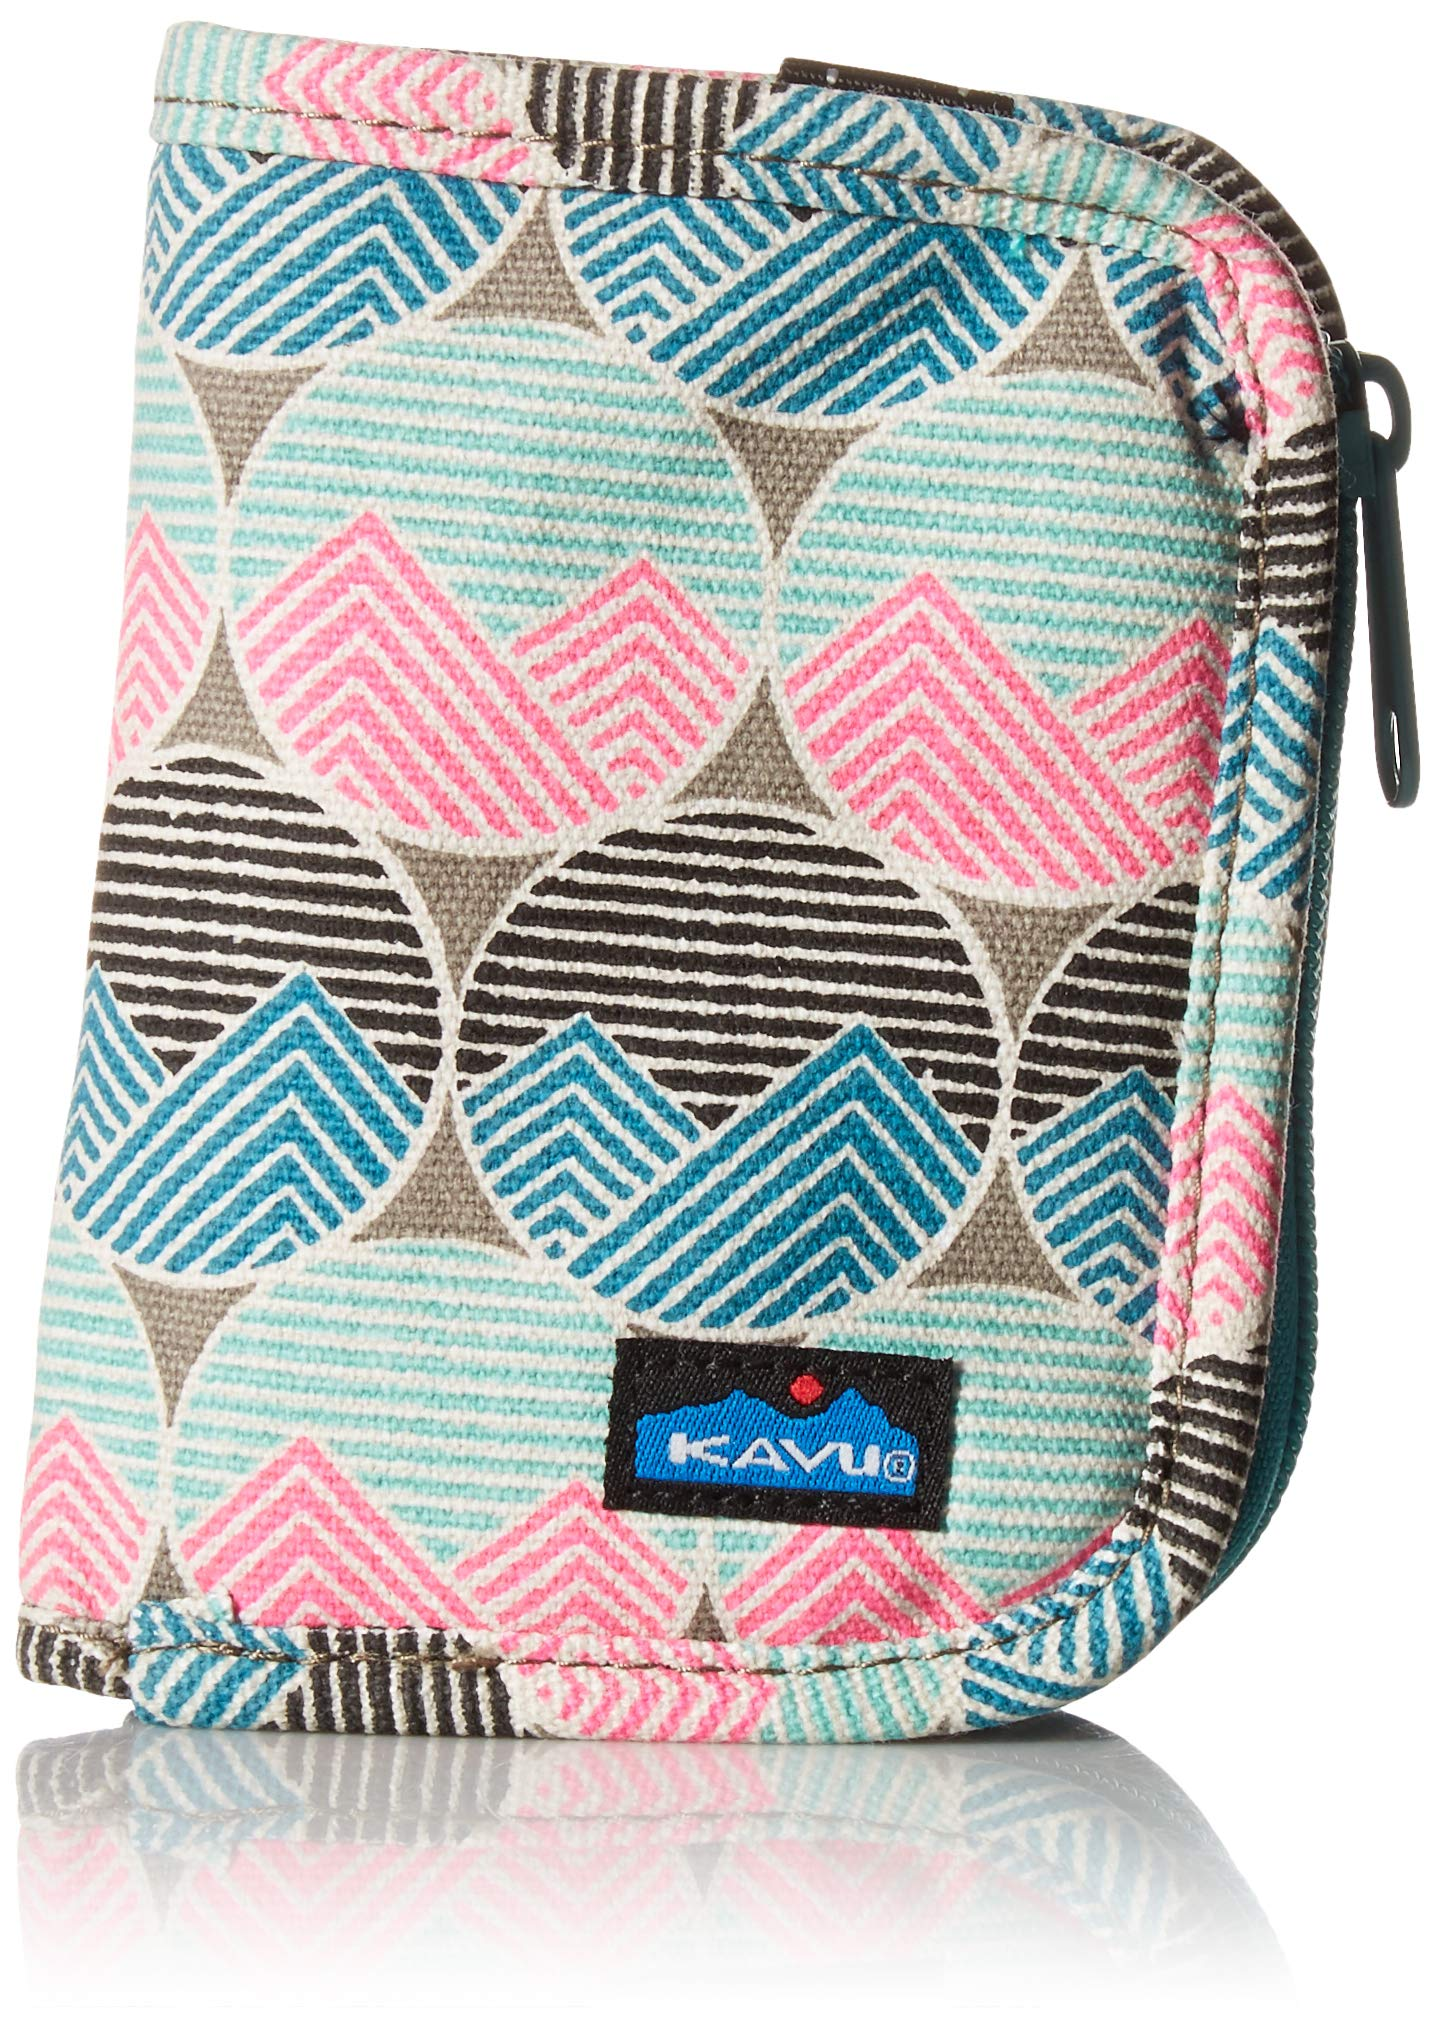 KAVU Women's Zippy Wallet, Horizon Dots, One Size